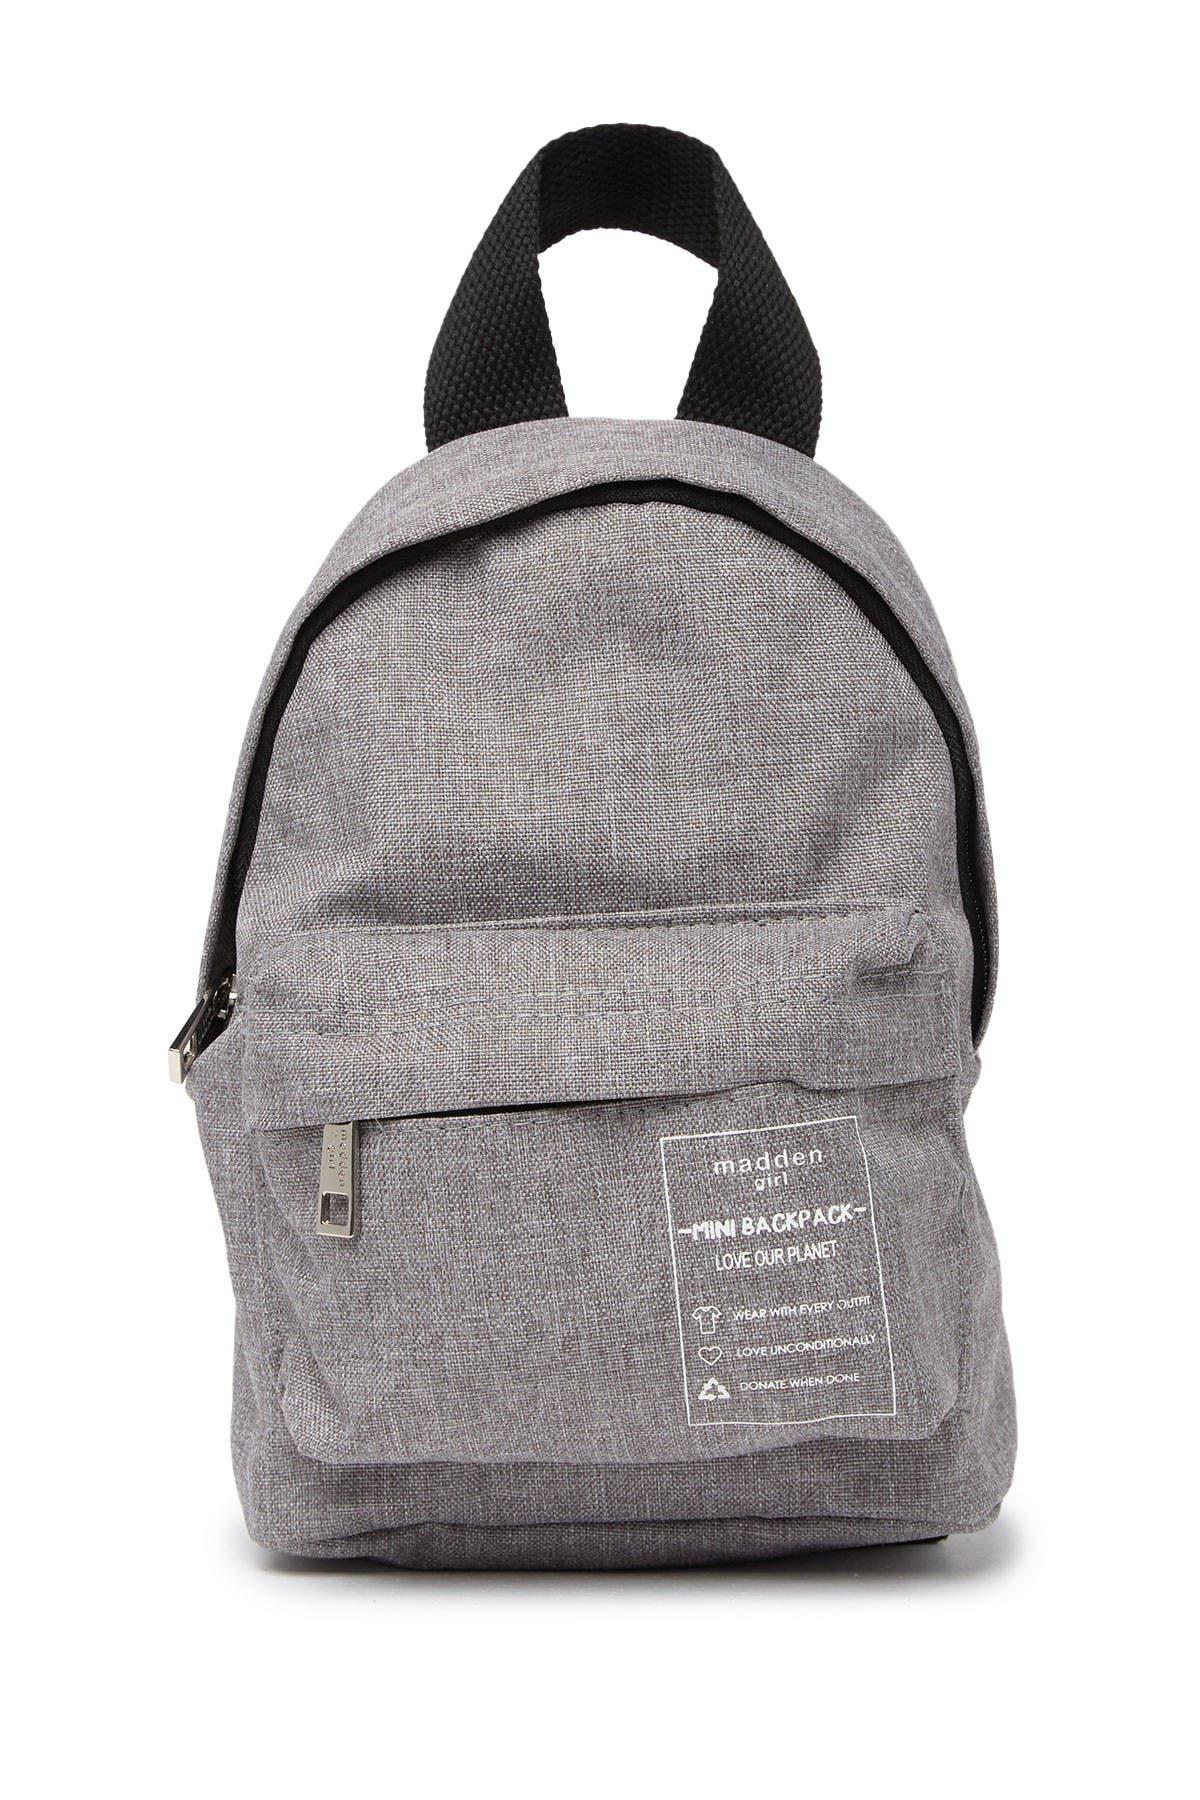 Madden Girl | Recycled Mini Backpack